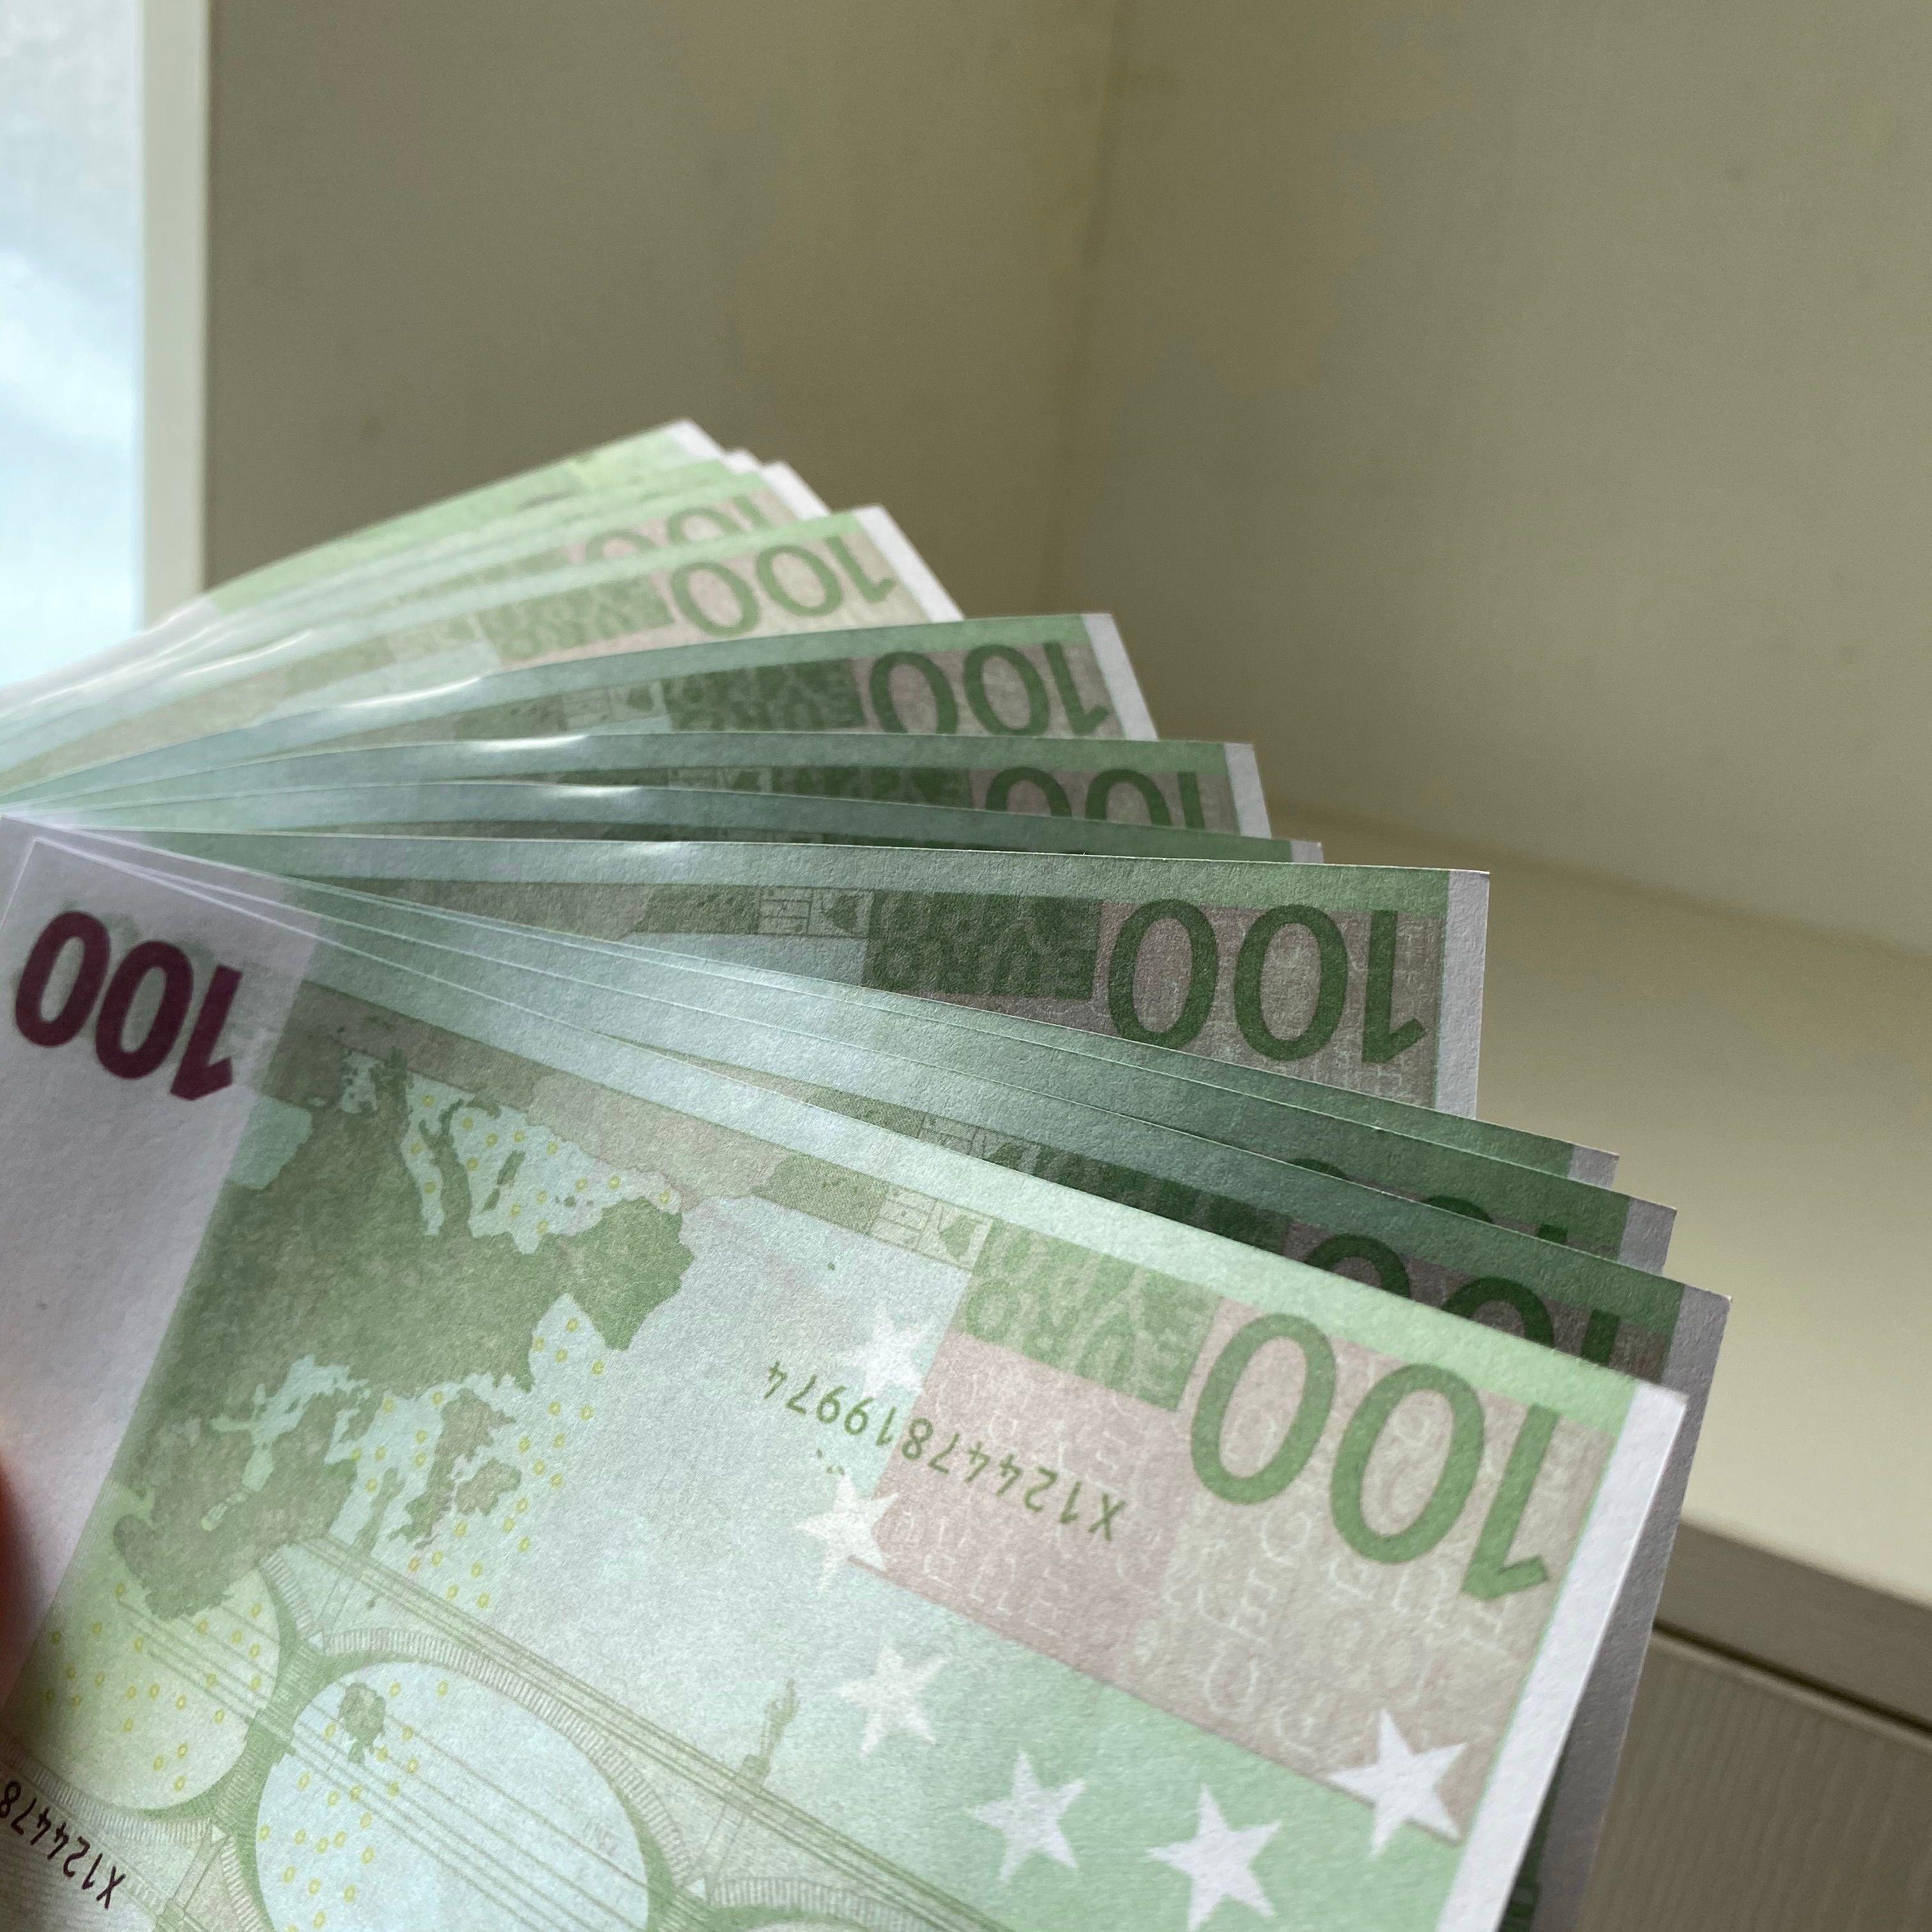 THIFF TICKET NIÑOS EURO PROP 100 TOY MONEY FALSETE REGALO FAUX Billet Papel Props Euro New Magic LE100-15 CJJRV